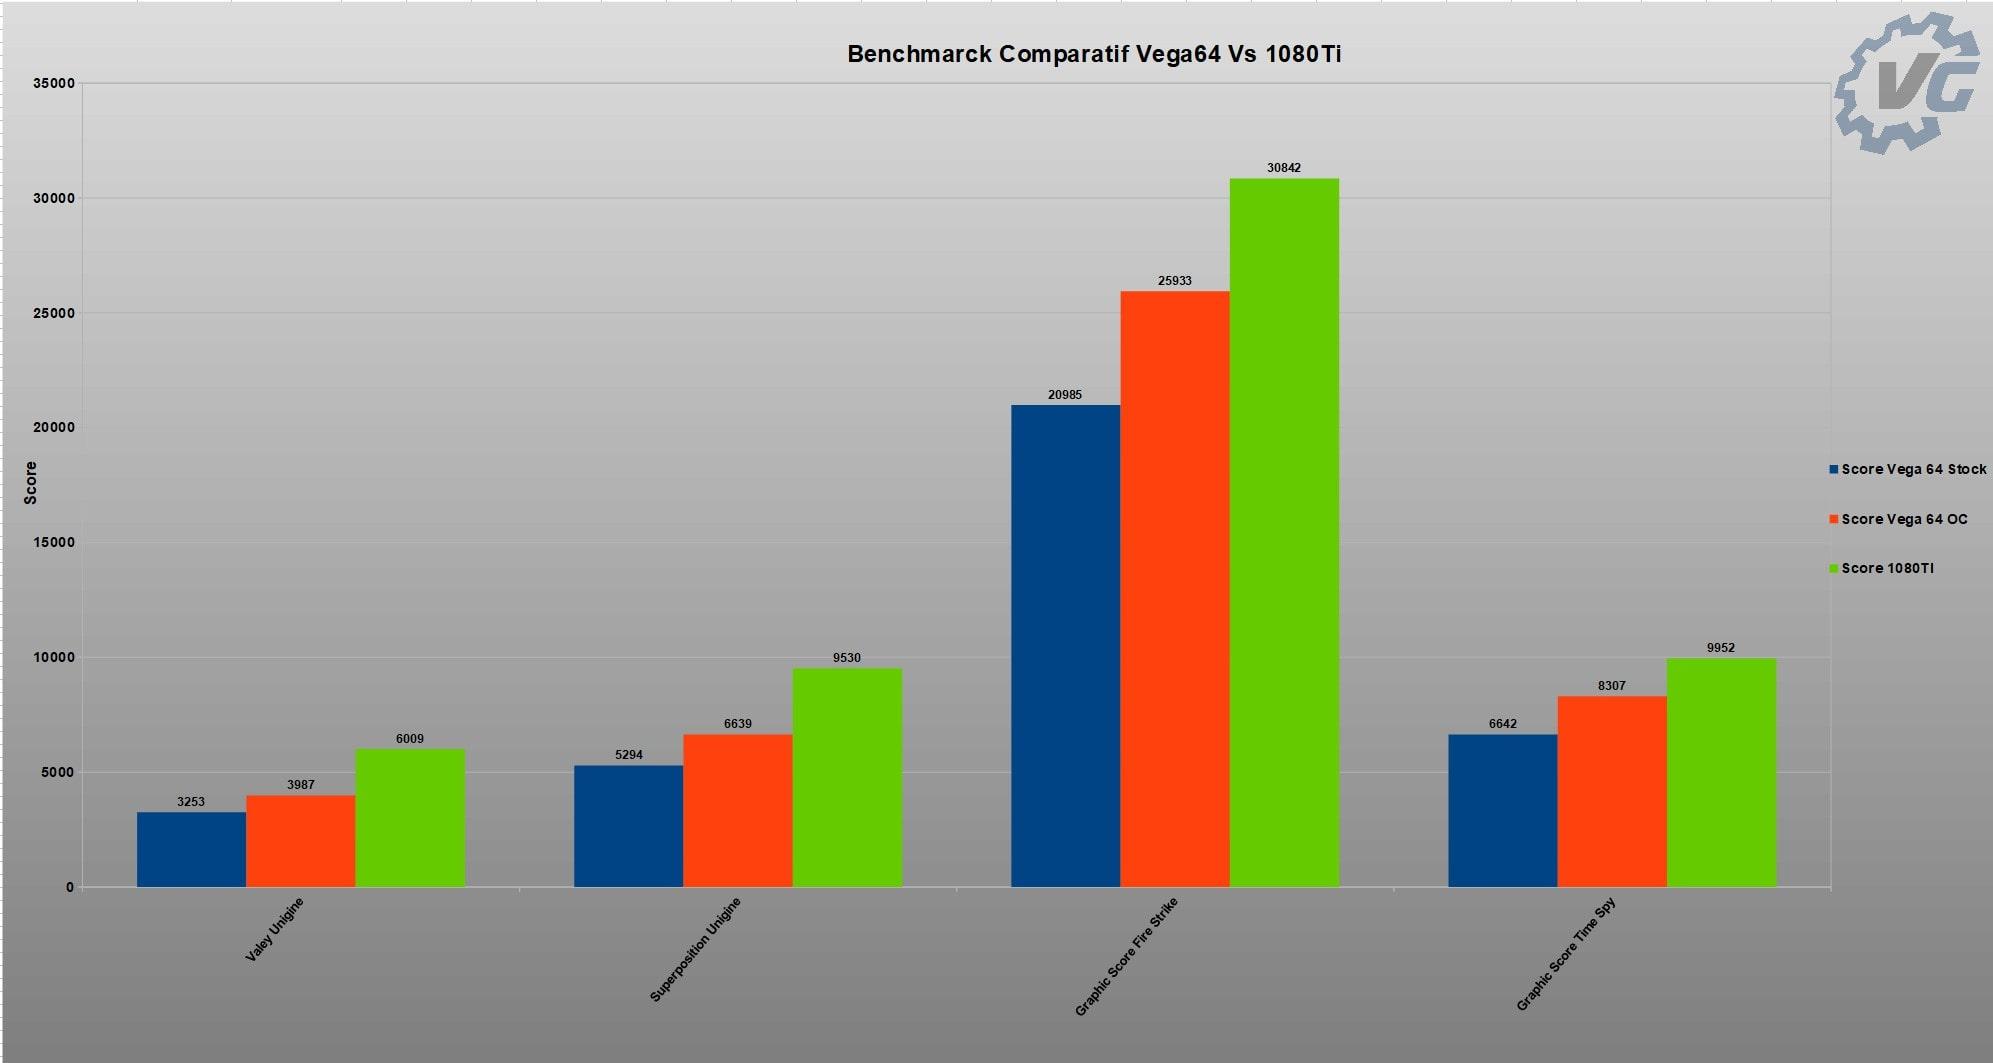 graphique de comparaison Benchmark